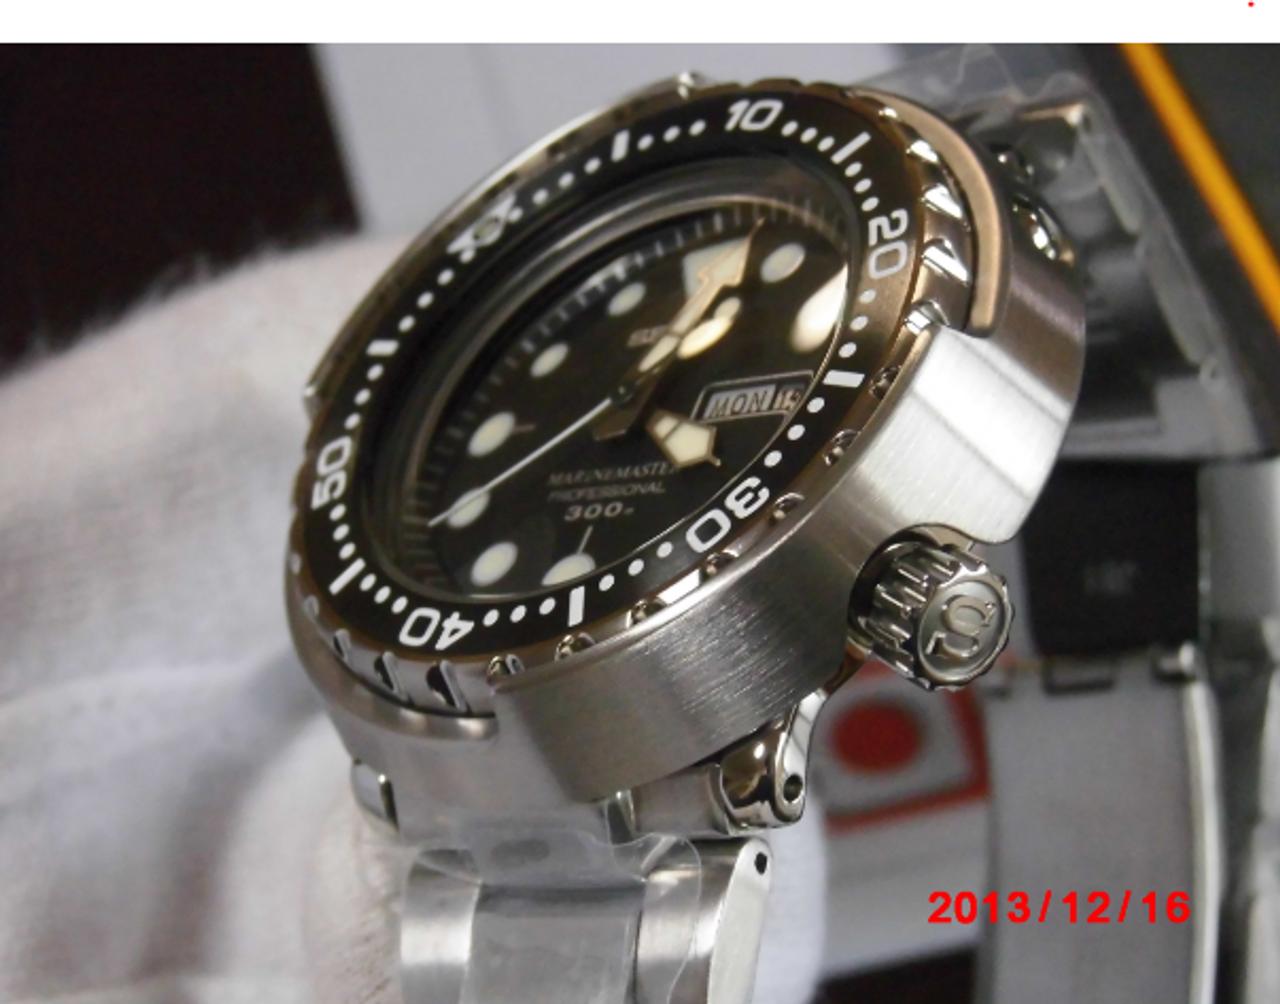 Seiko Prospex SBBN015 Marine Master